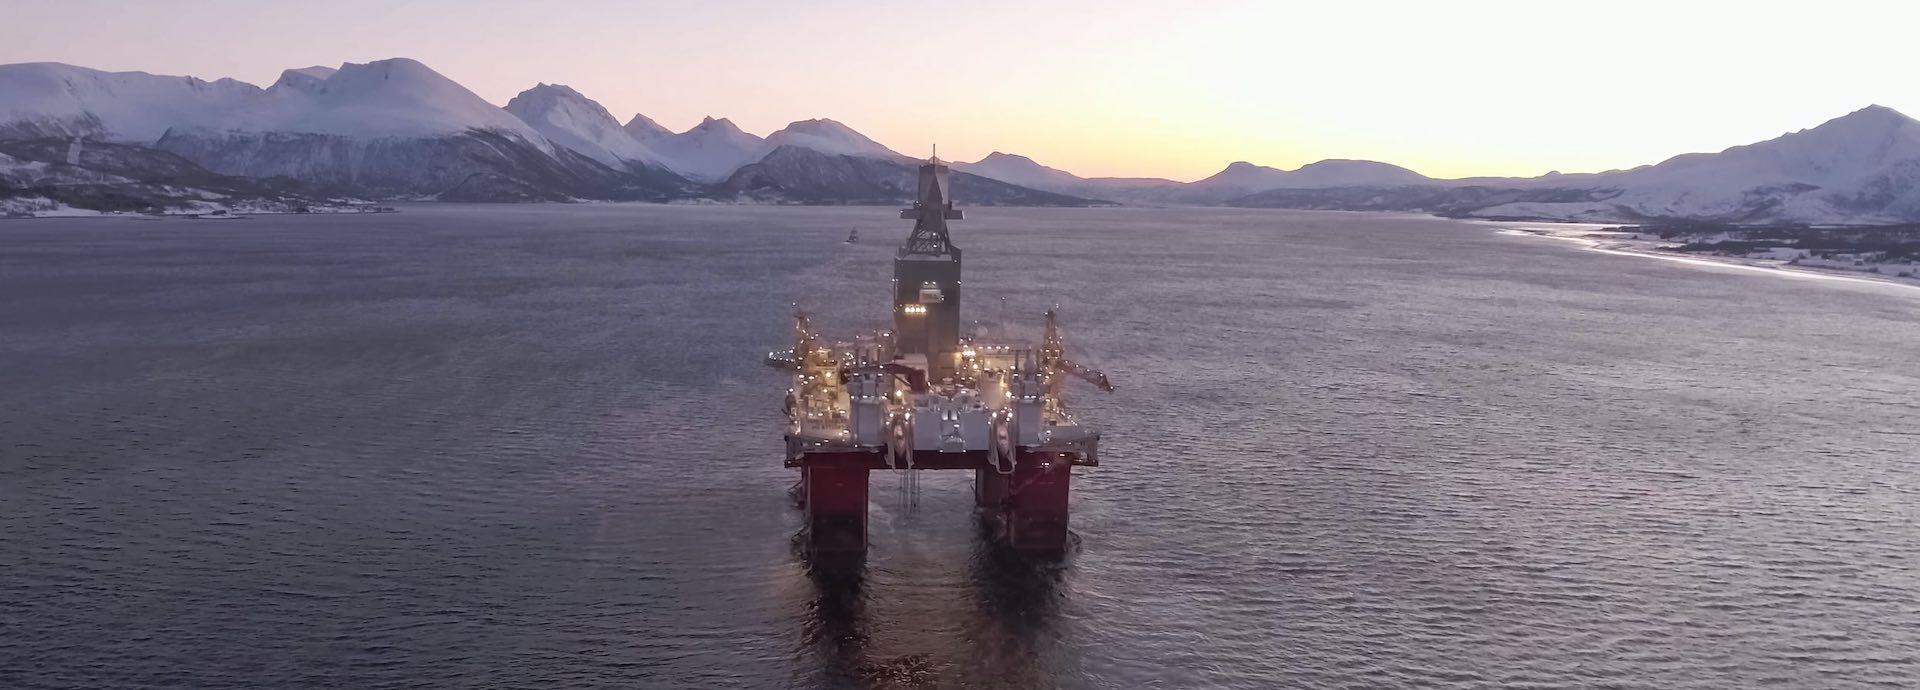 Offshore drilling rig winter scene